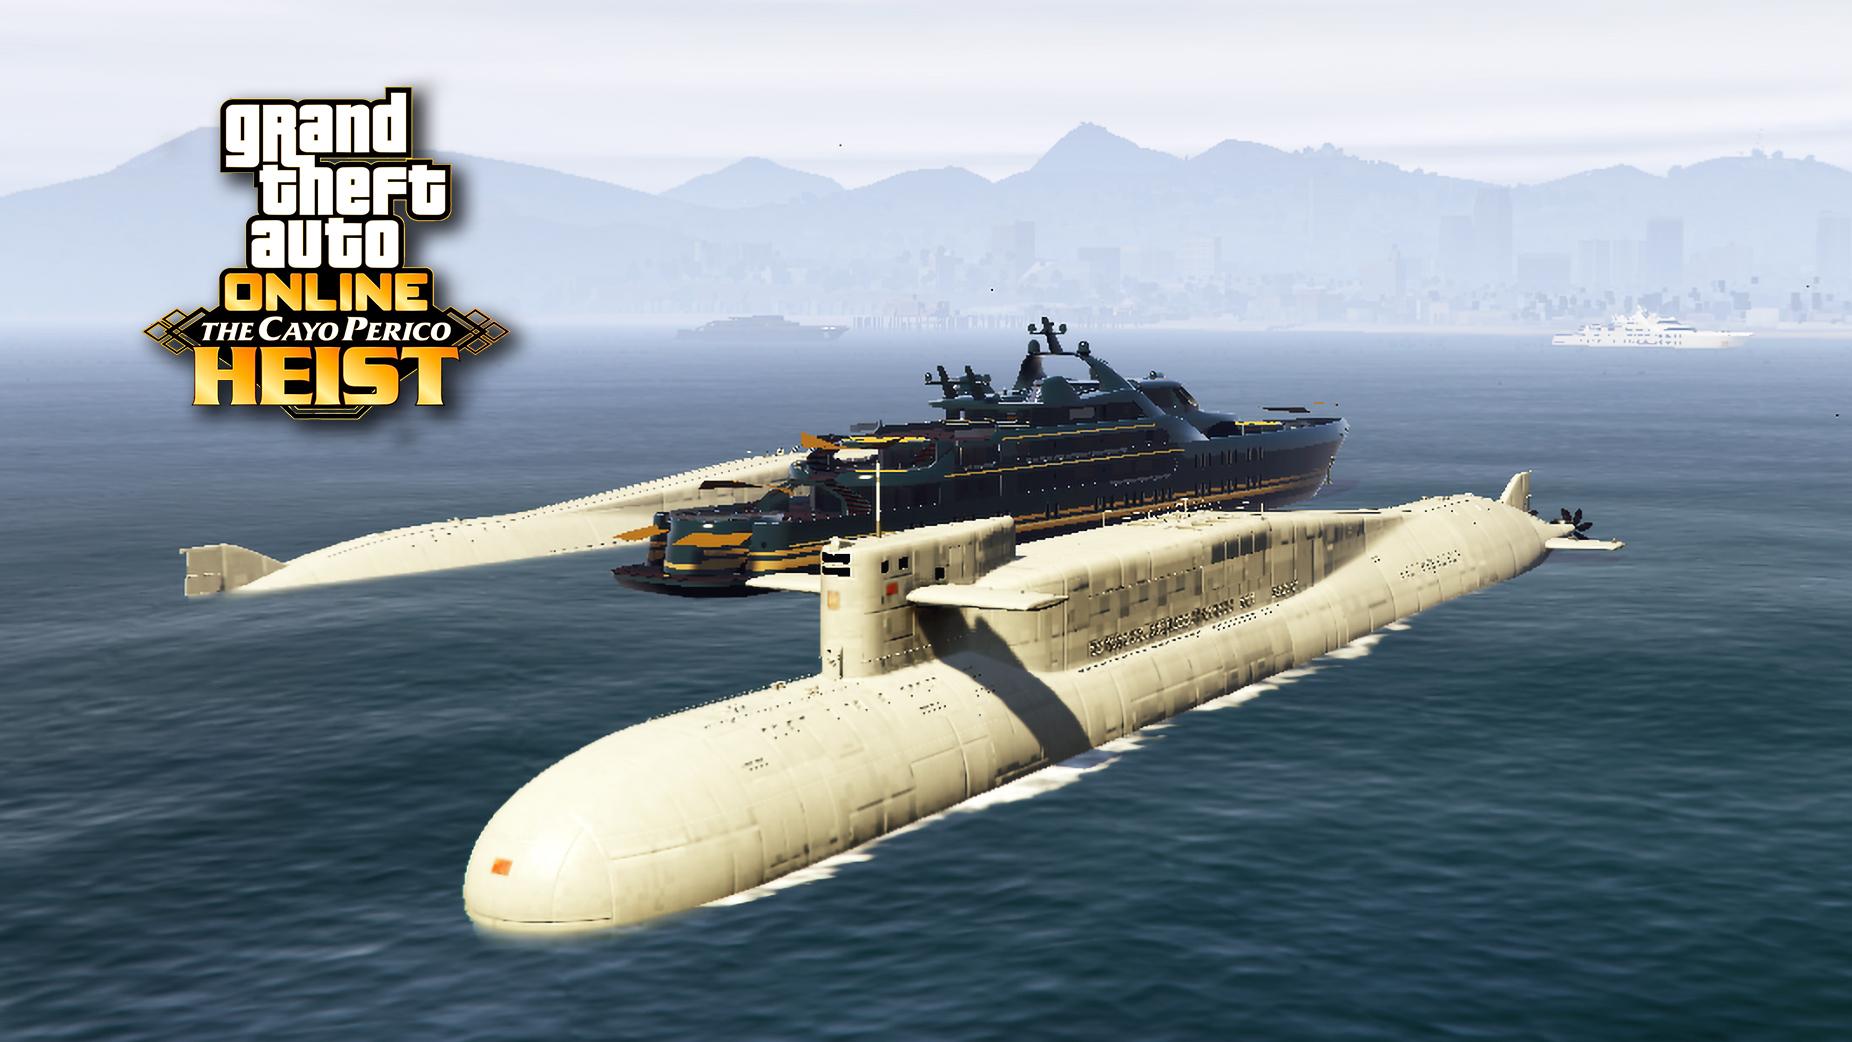 【GTA5】最新载具资产:虎鲸潜水艇,拥有垂发和直升机的导弹核潜艇!